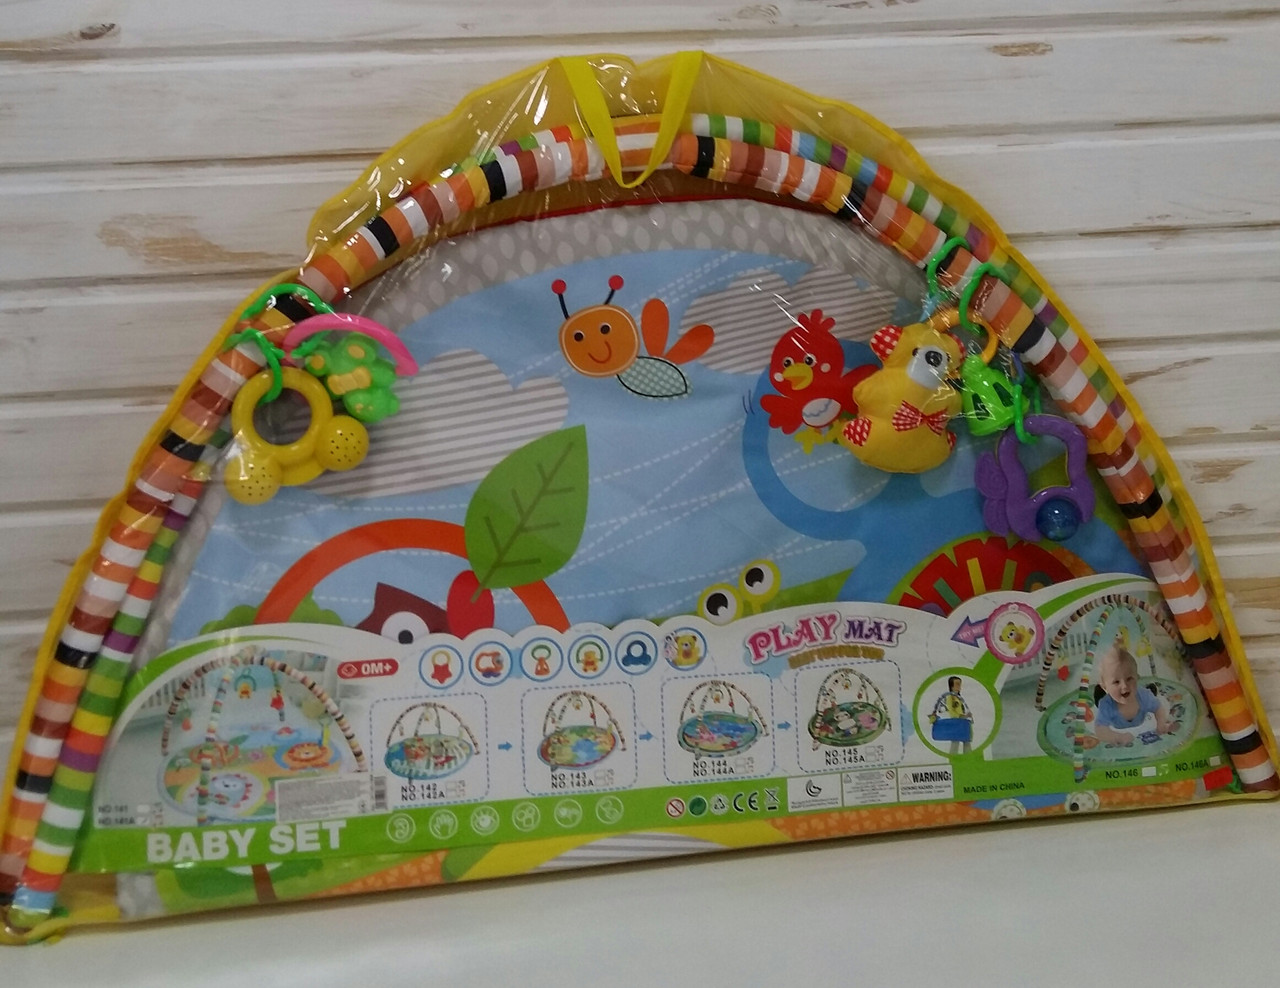 Килимок для немовляти з дугами 141-142-146